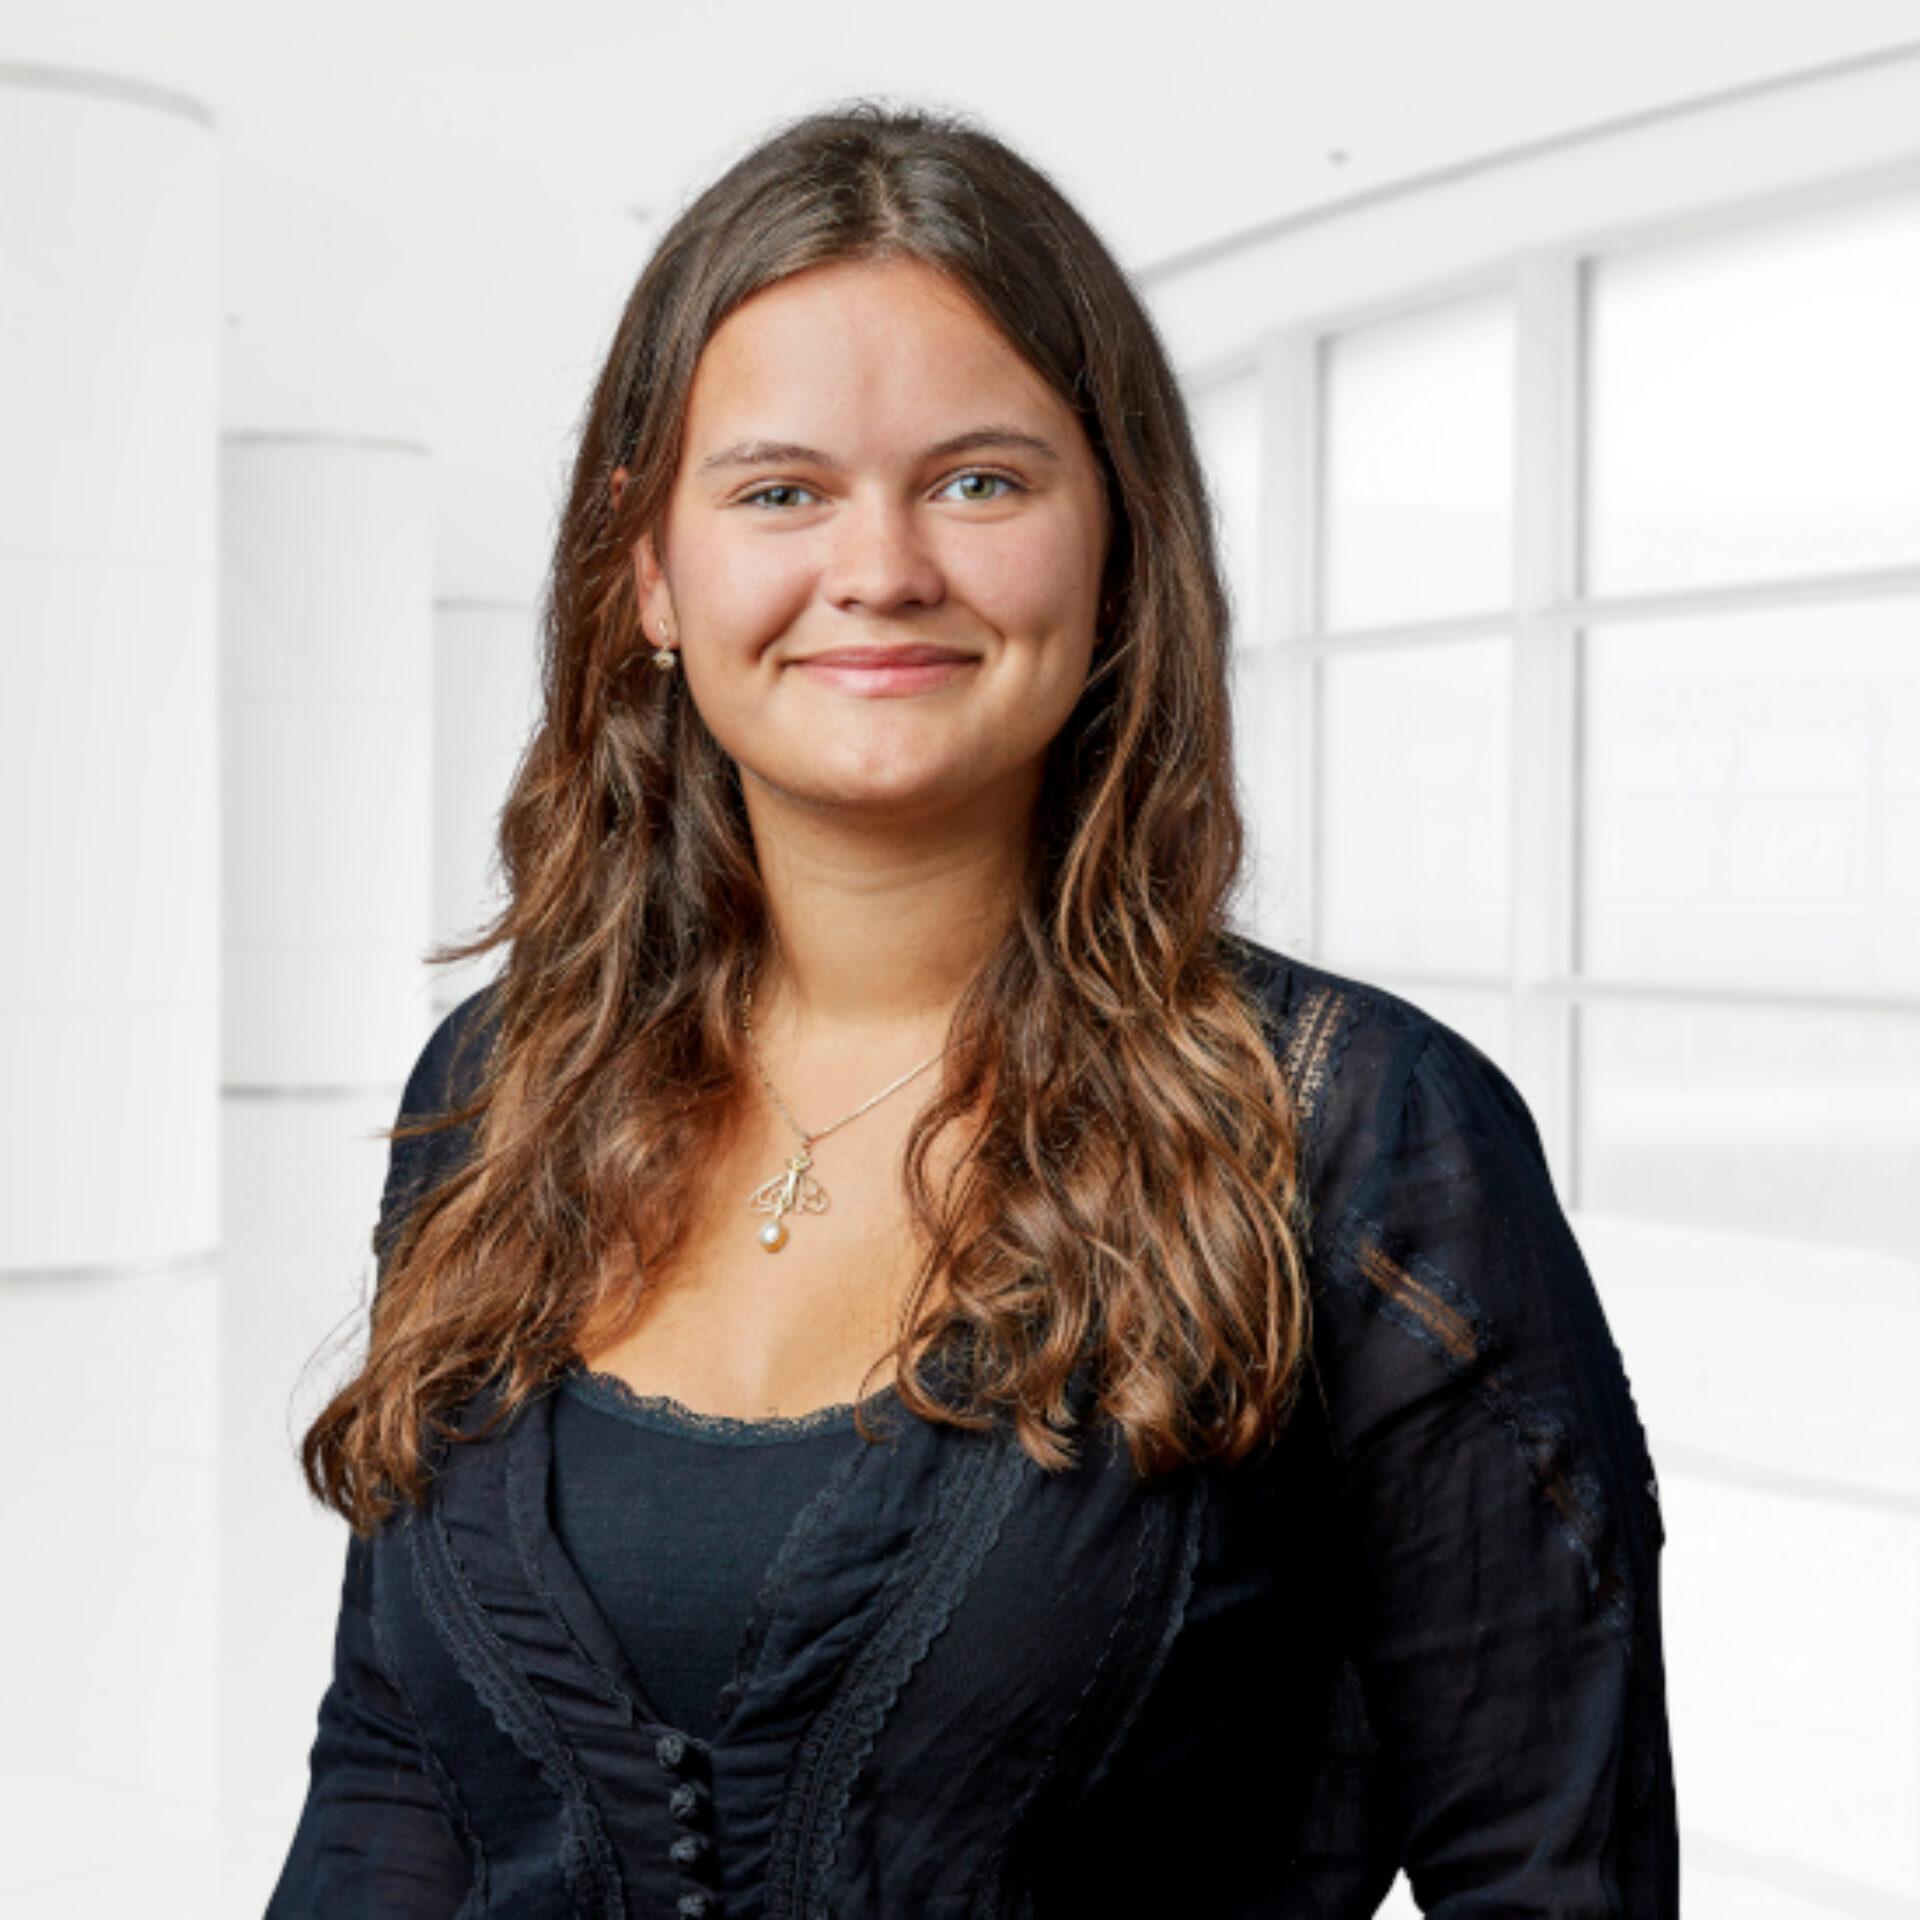 Photo of Victoria Rosenmeier